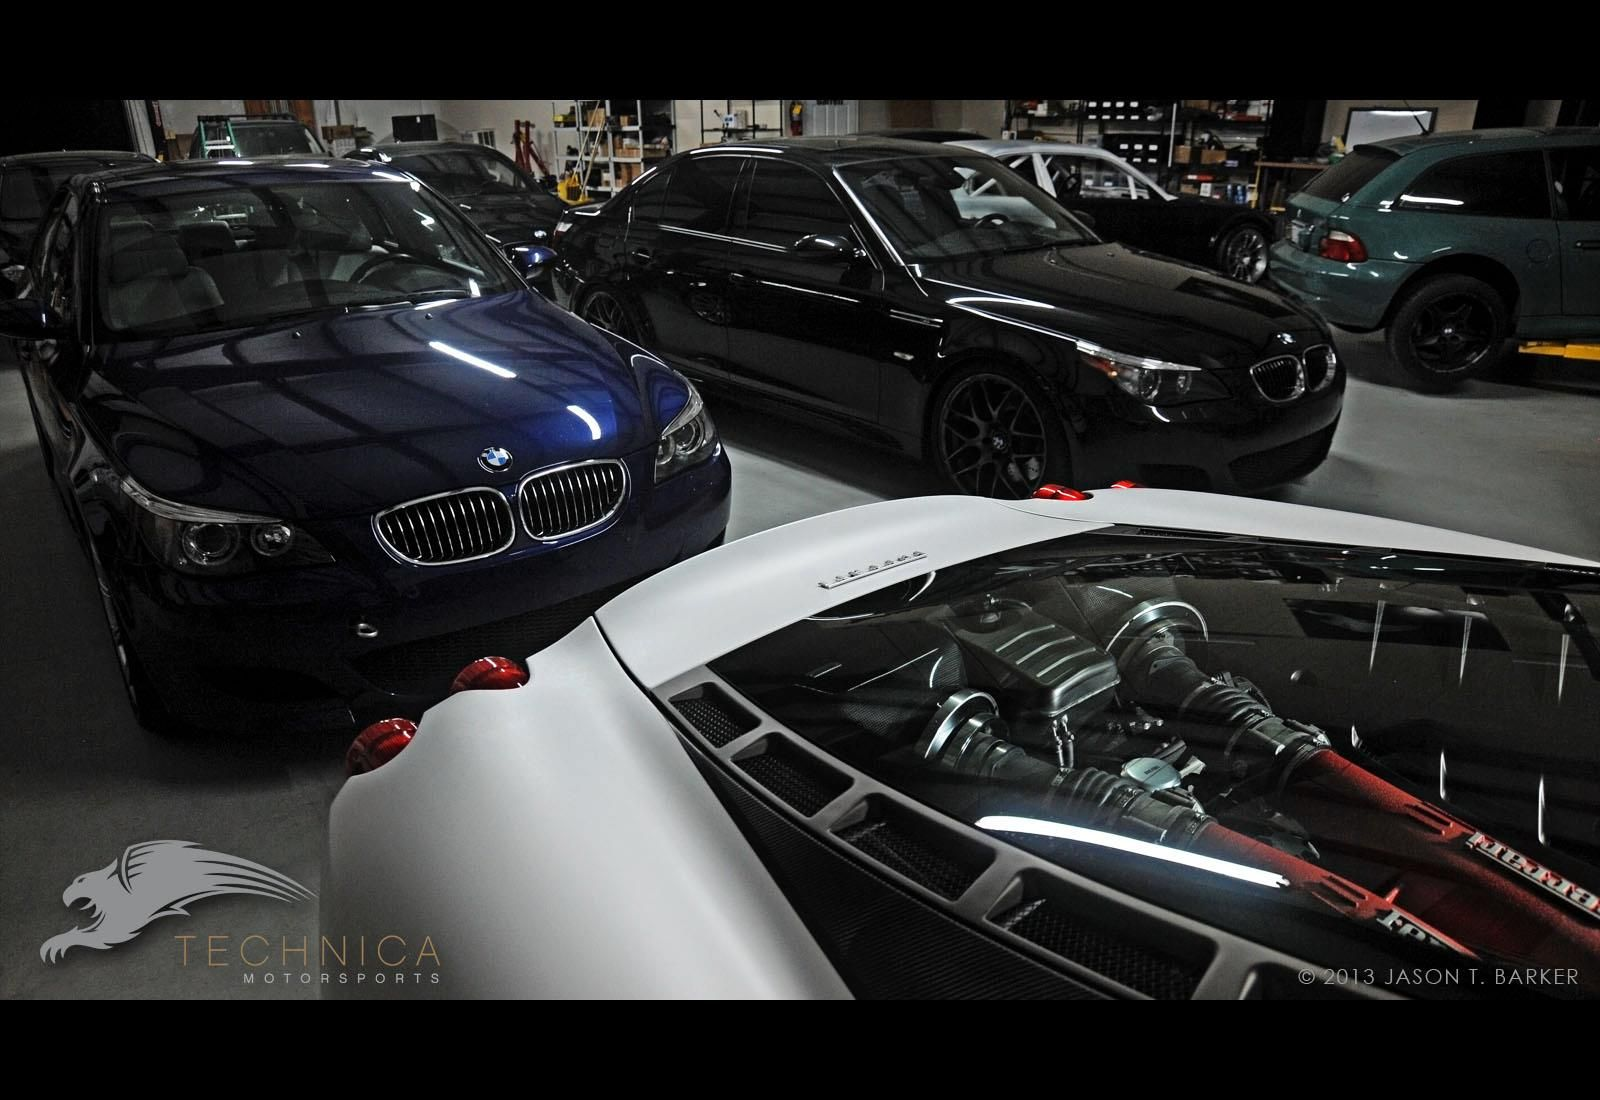 Technica Motorsports garage Atlanta, Ga Dream garage